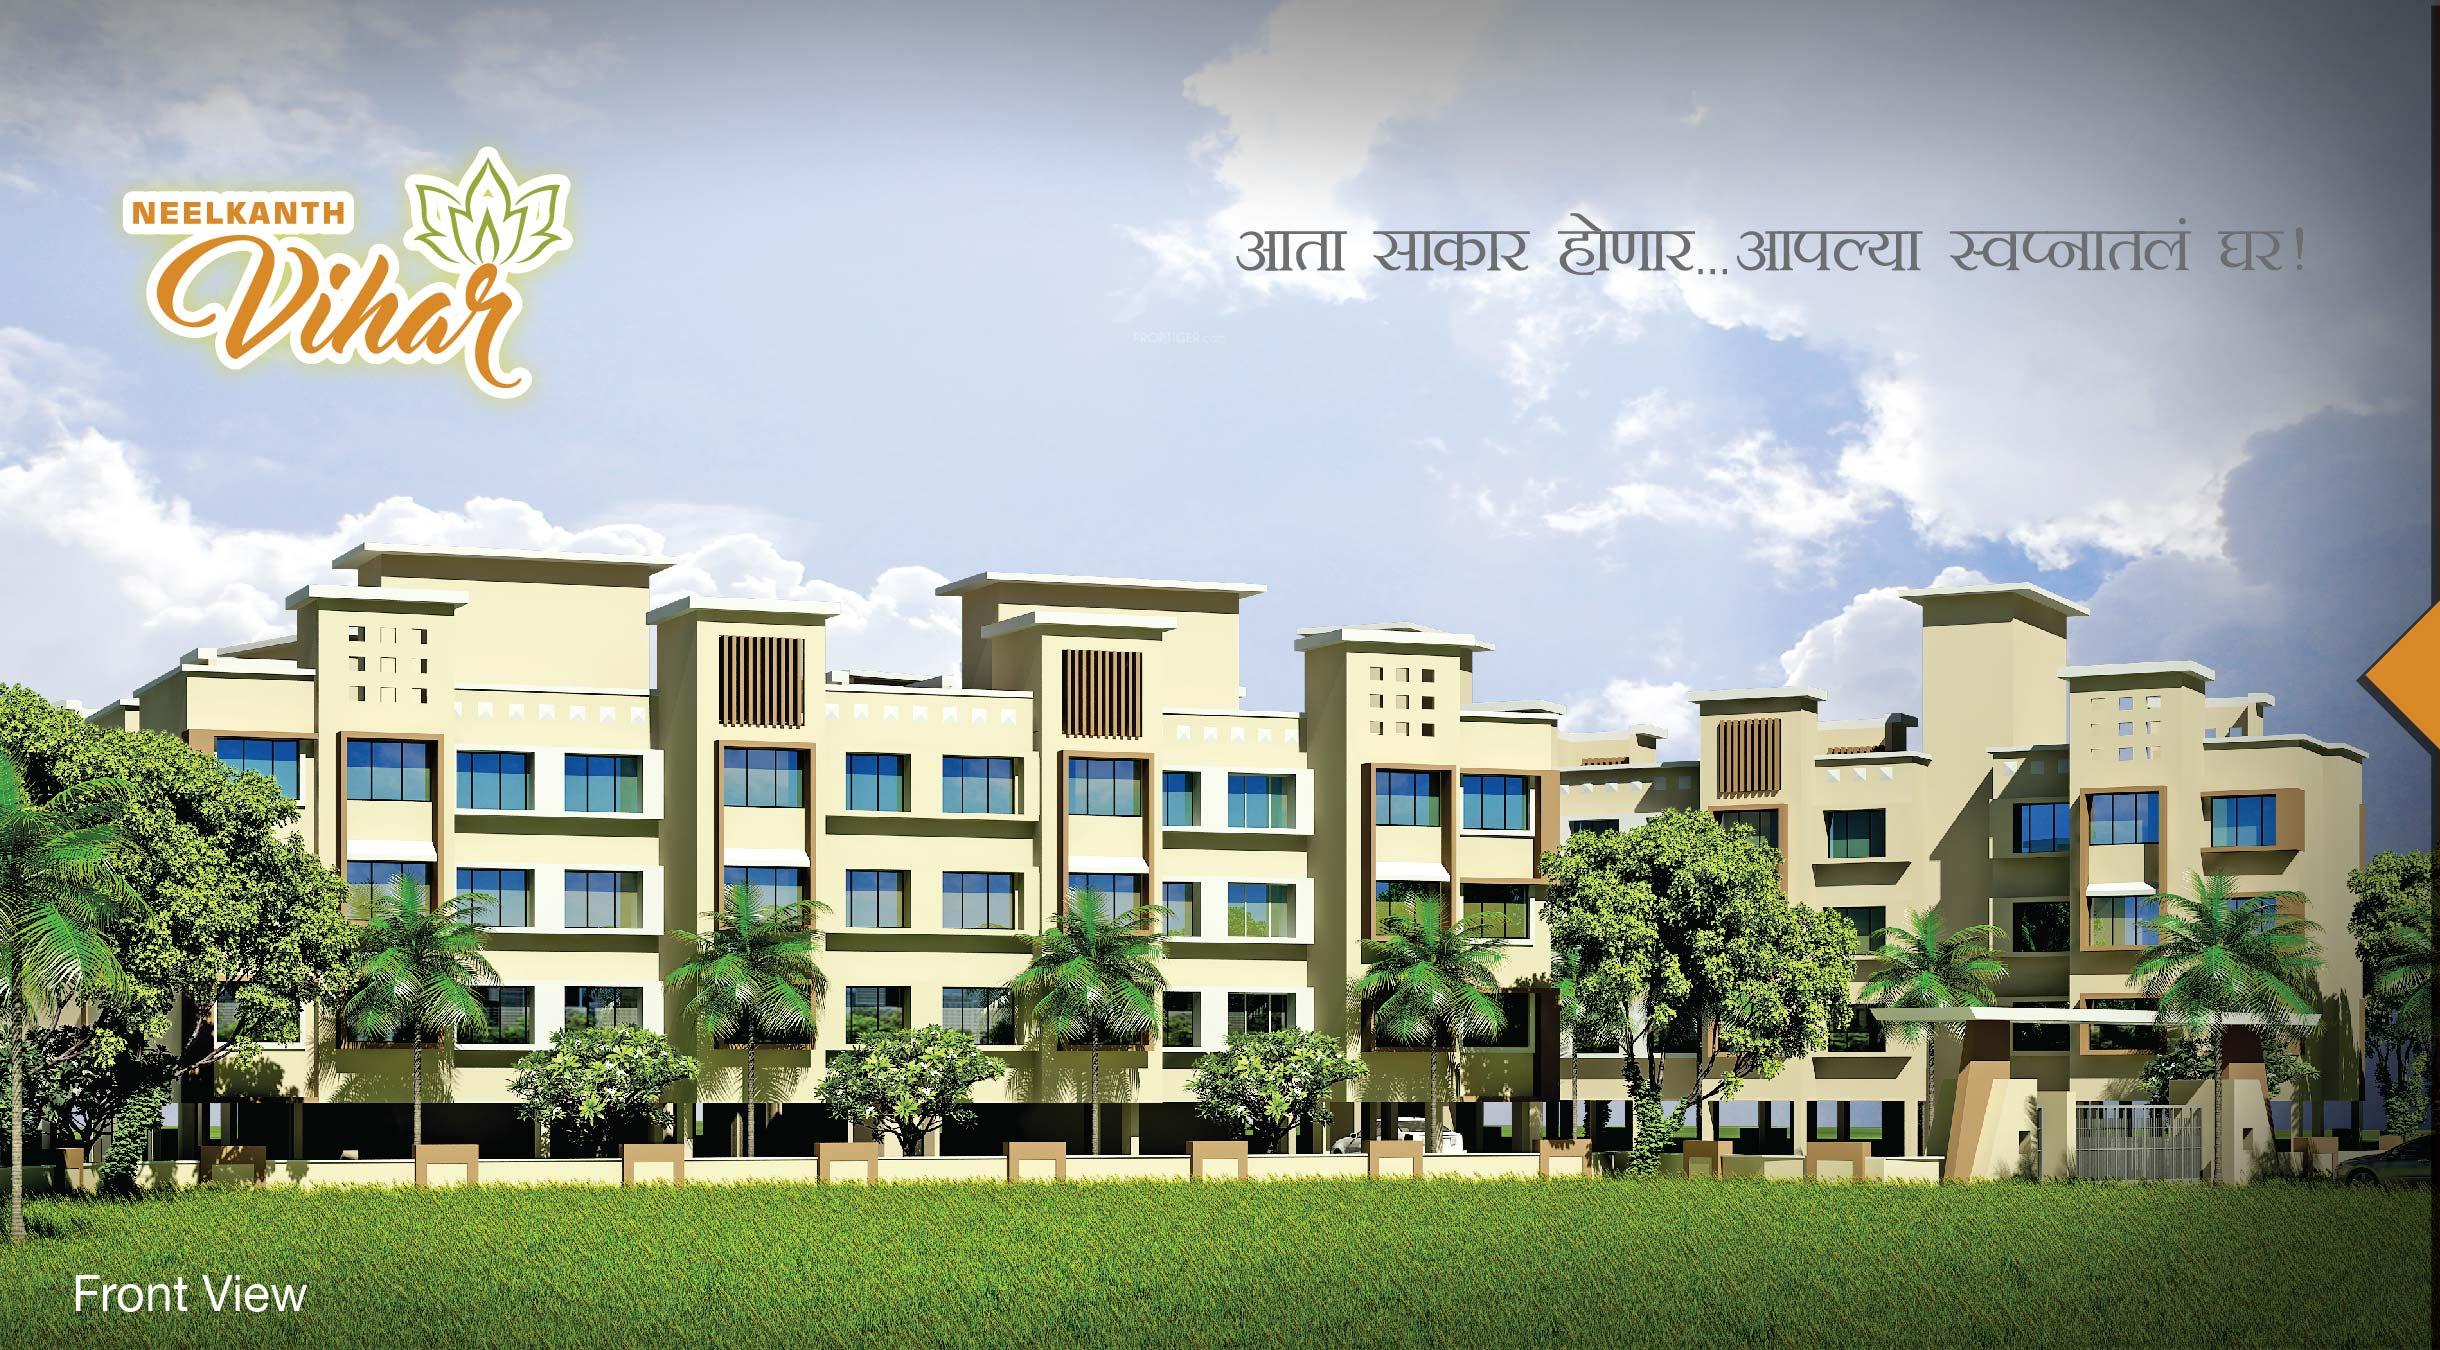 Neelkanth Neelkanth Vihar Phase I in Panvel, Mumbai - Price